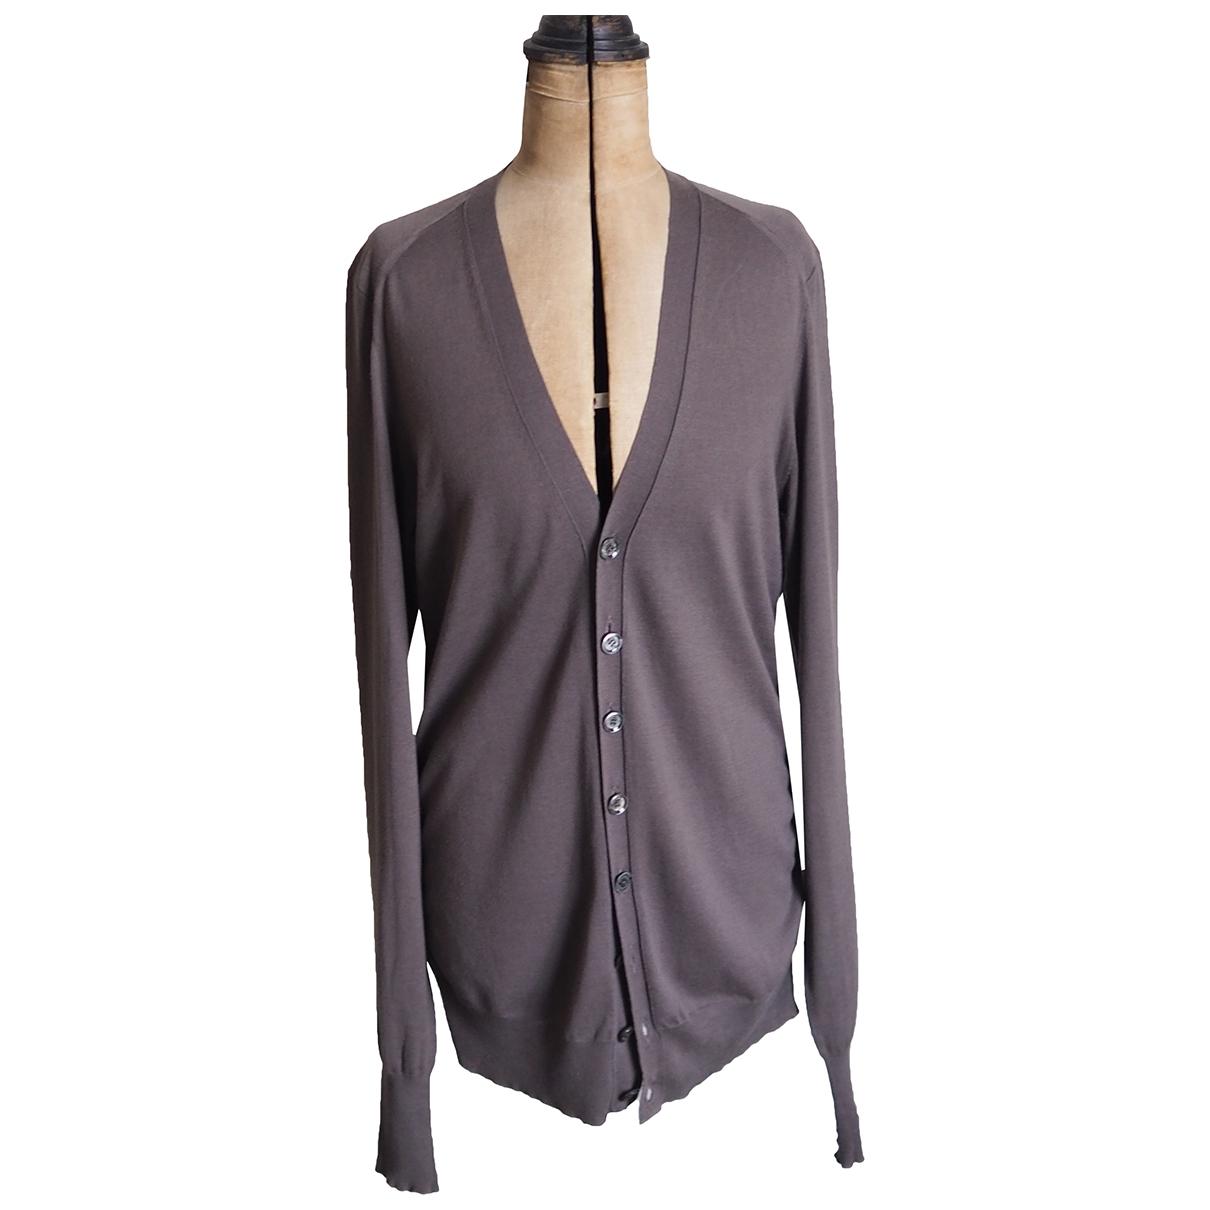 Burberry \N Anthracite Cashmere Knitwear & Sweatshirts for Men M International